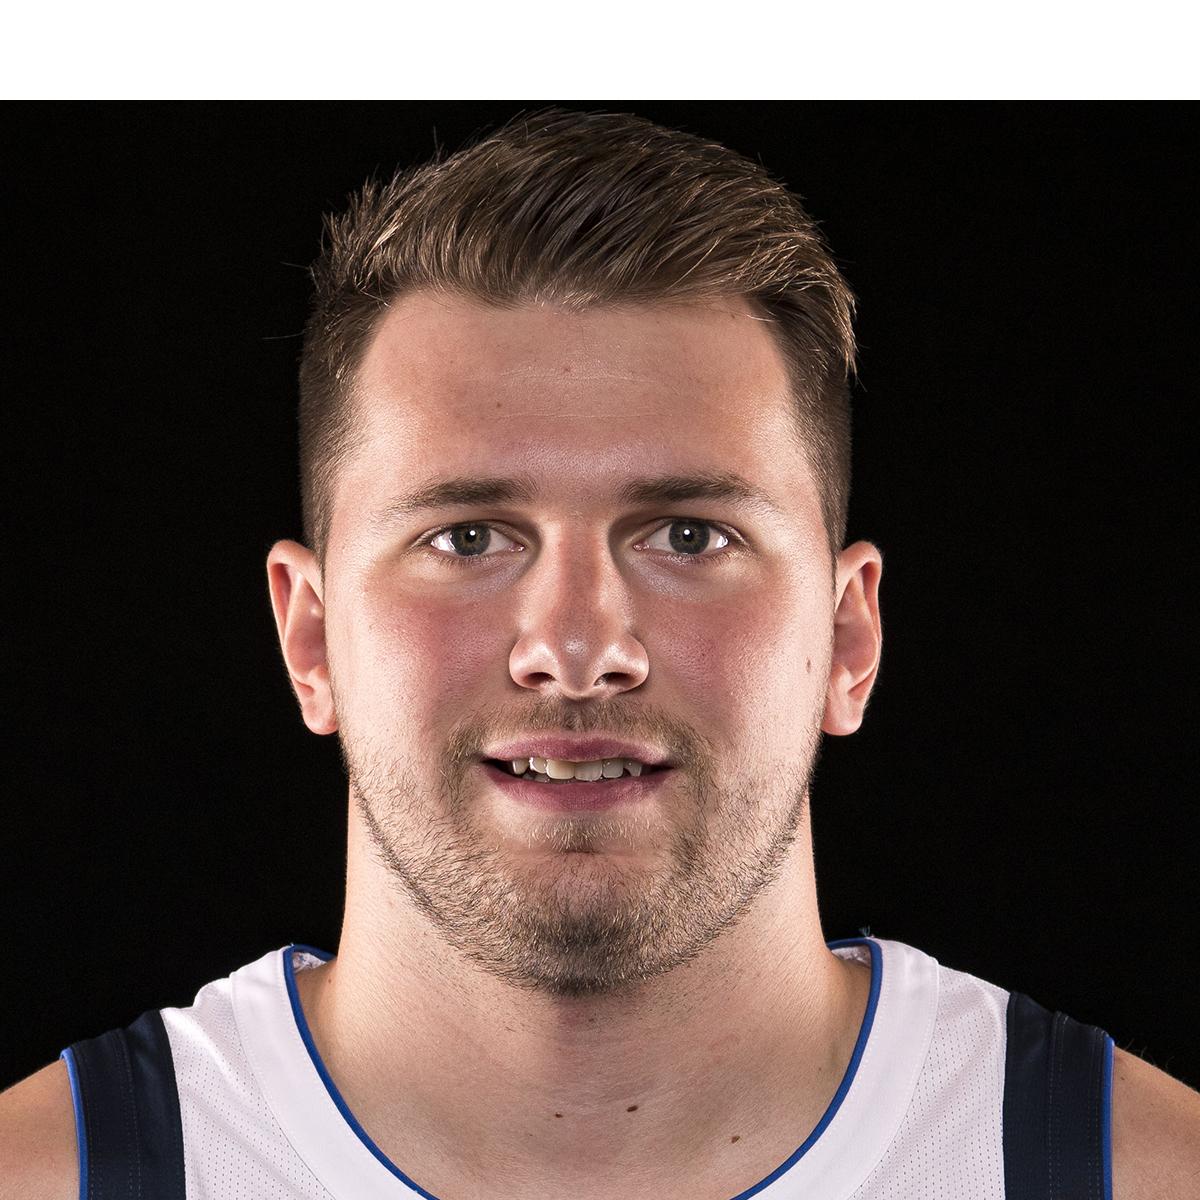 NBA: Player Headshots 2021